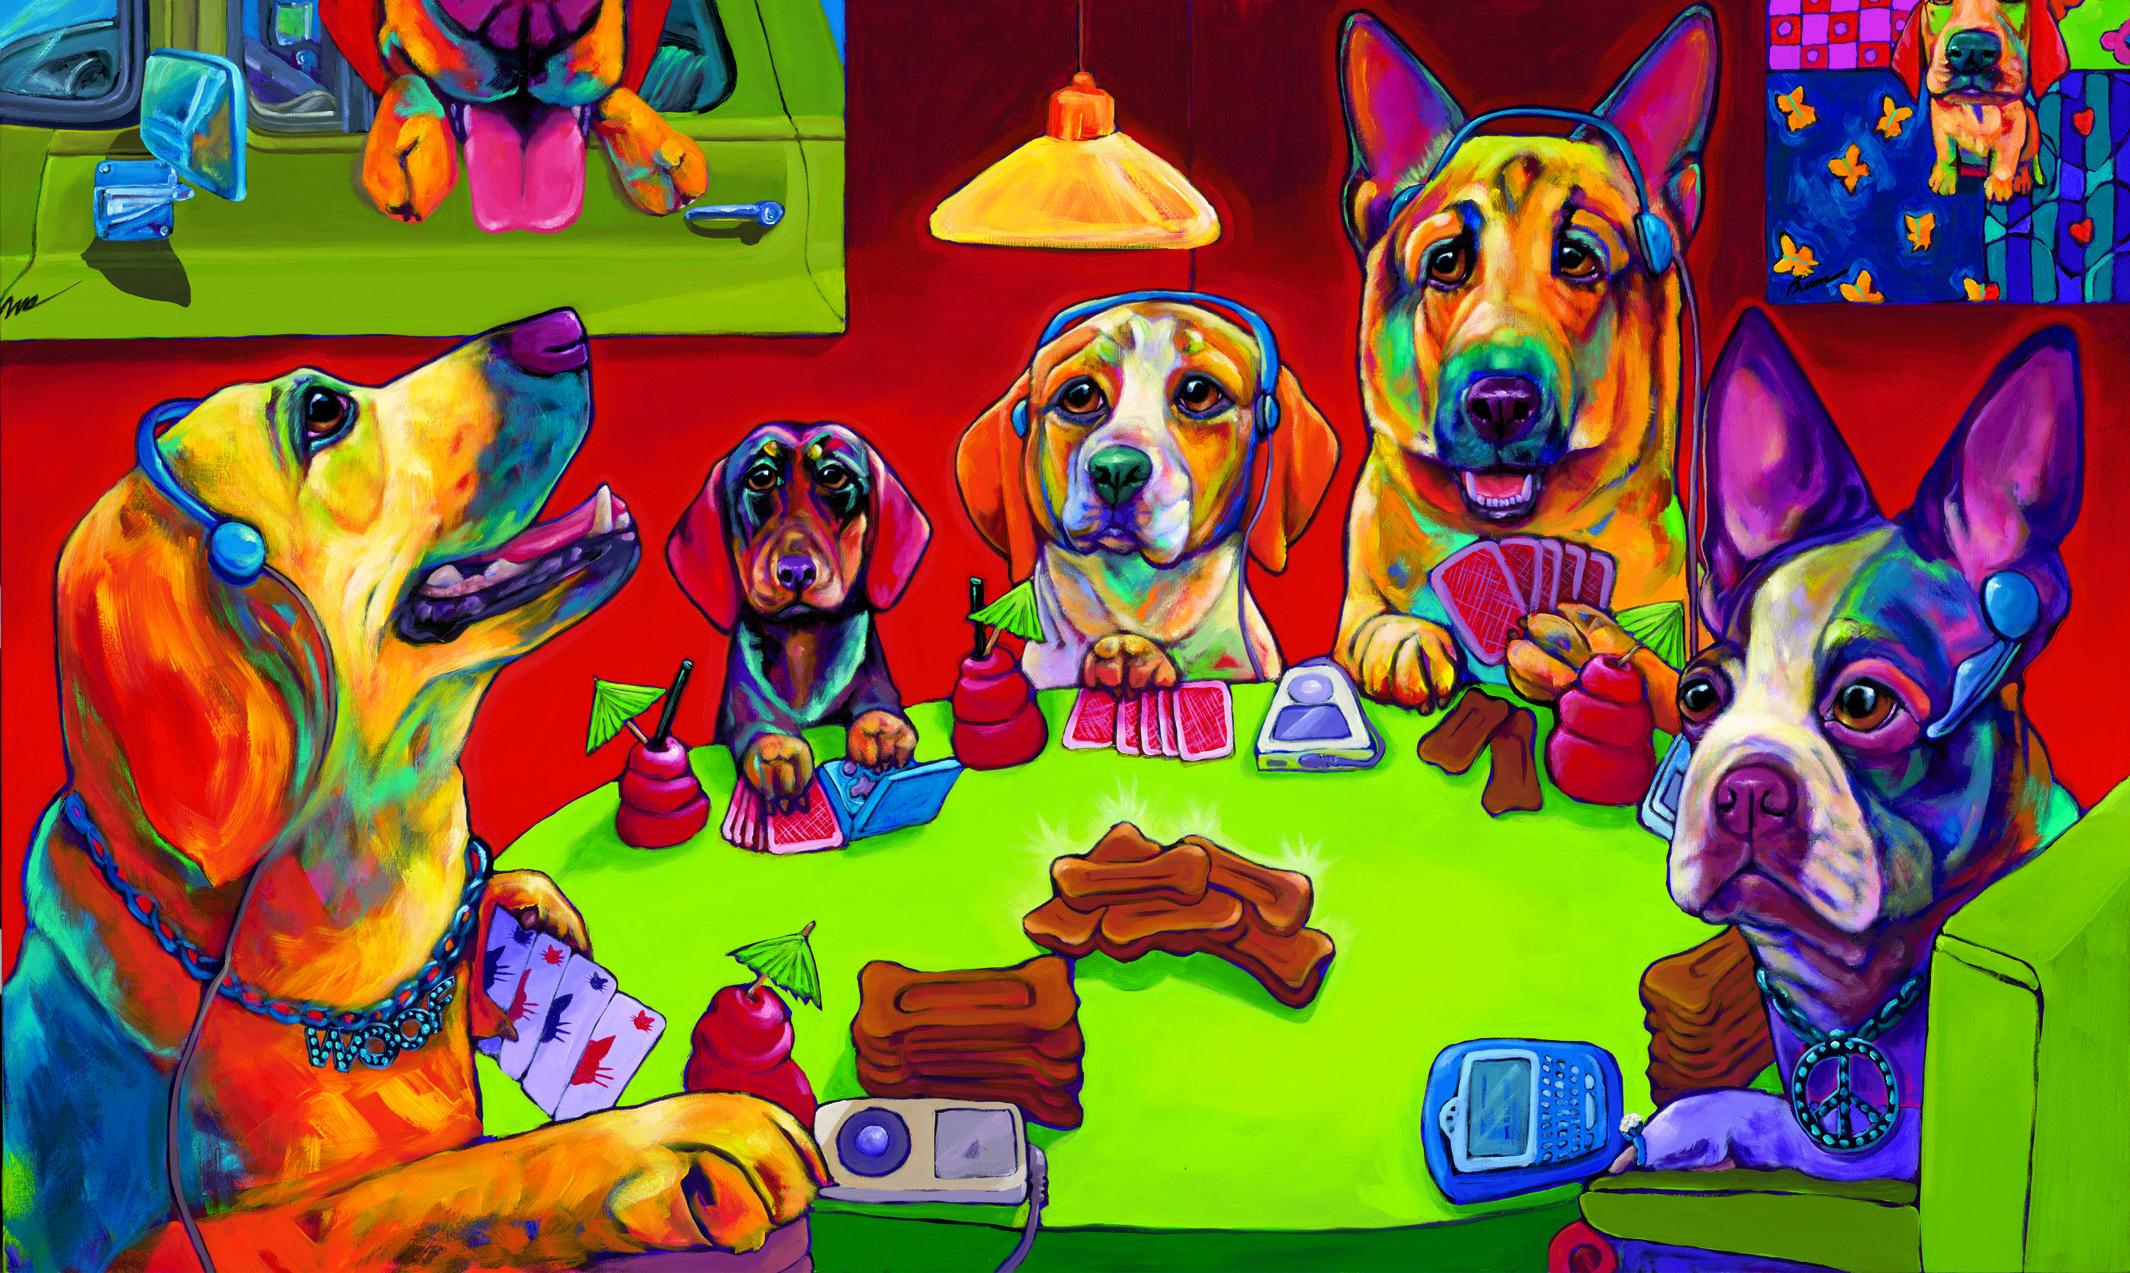 Best casino in atlantic city to play poker